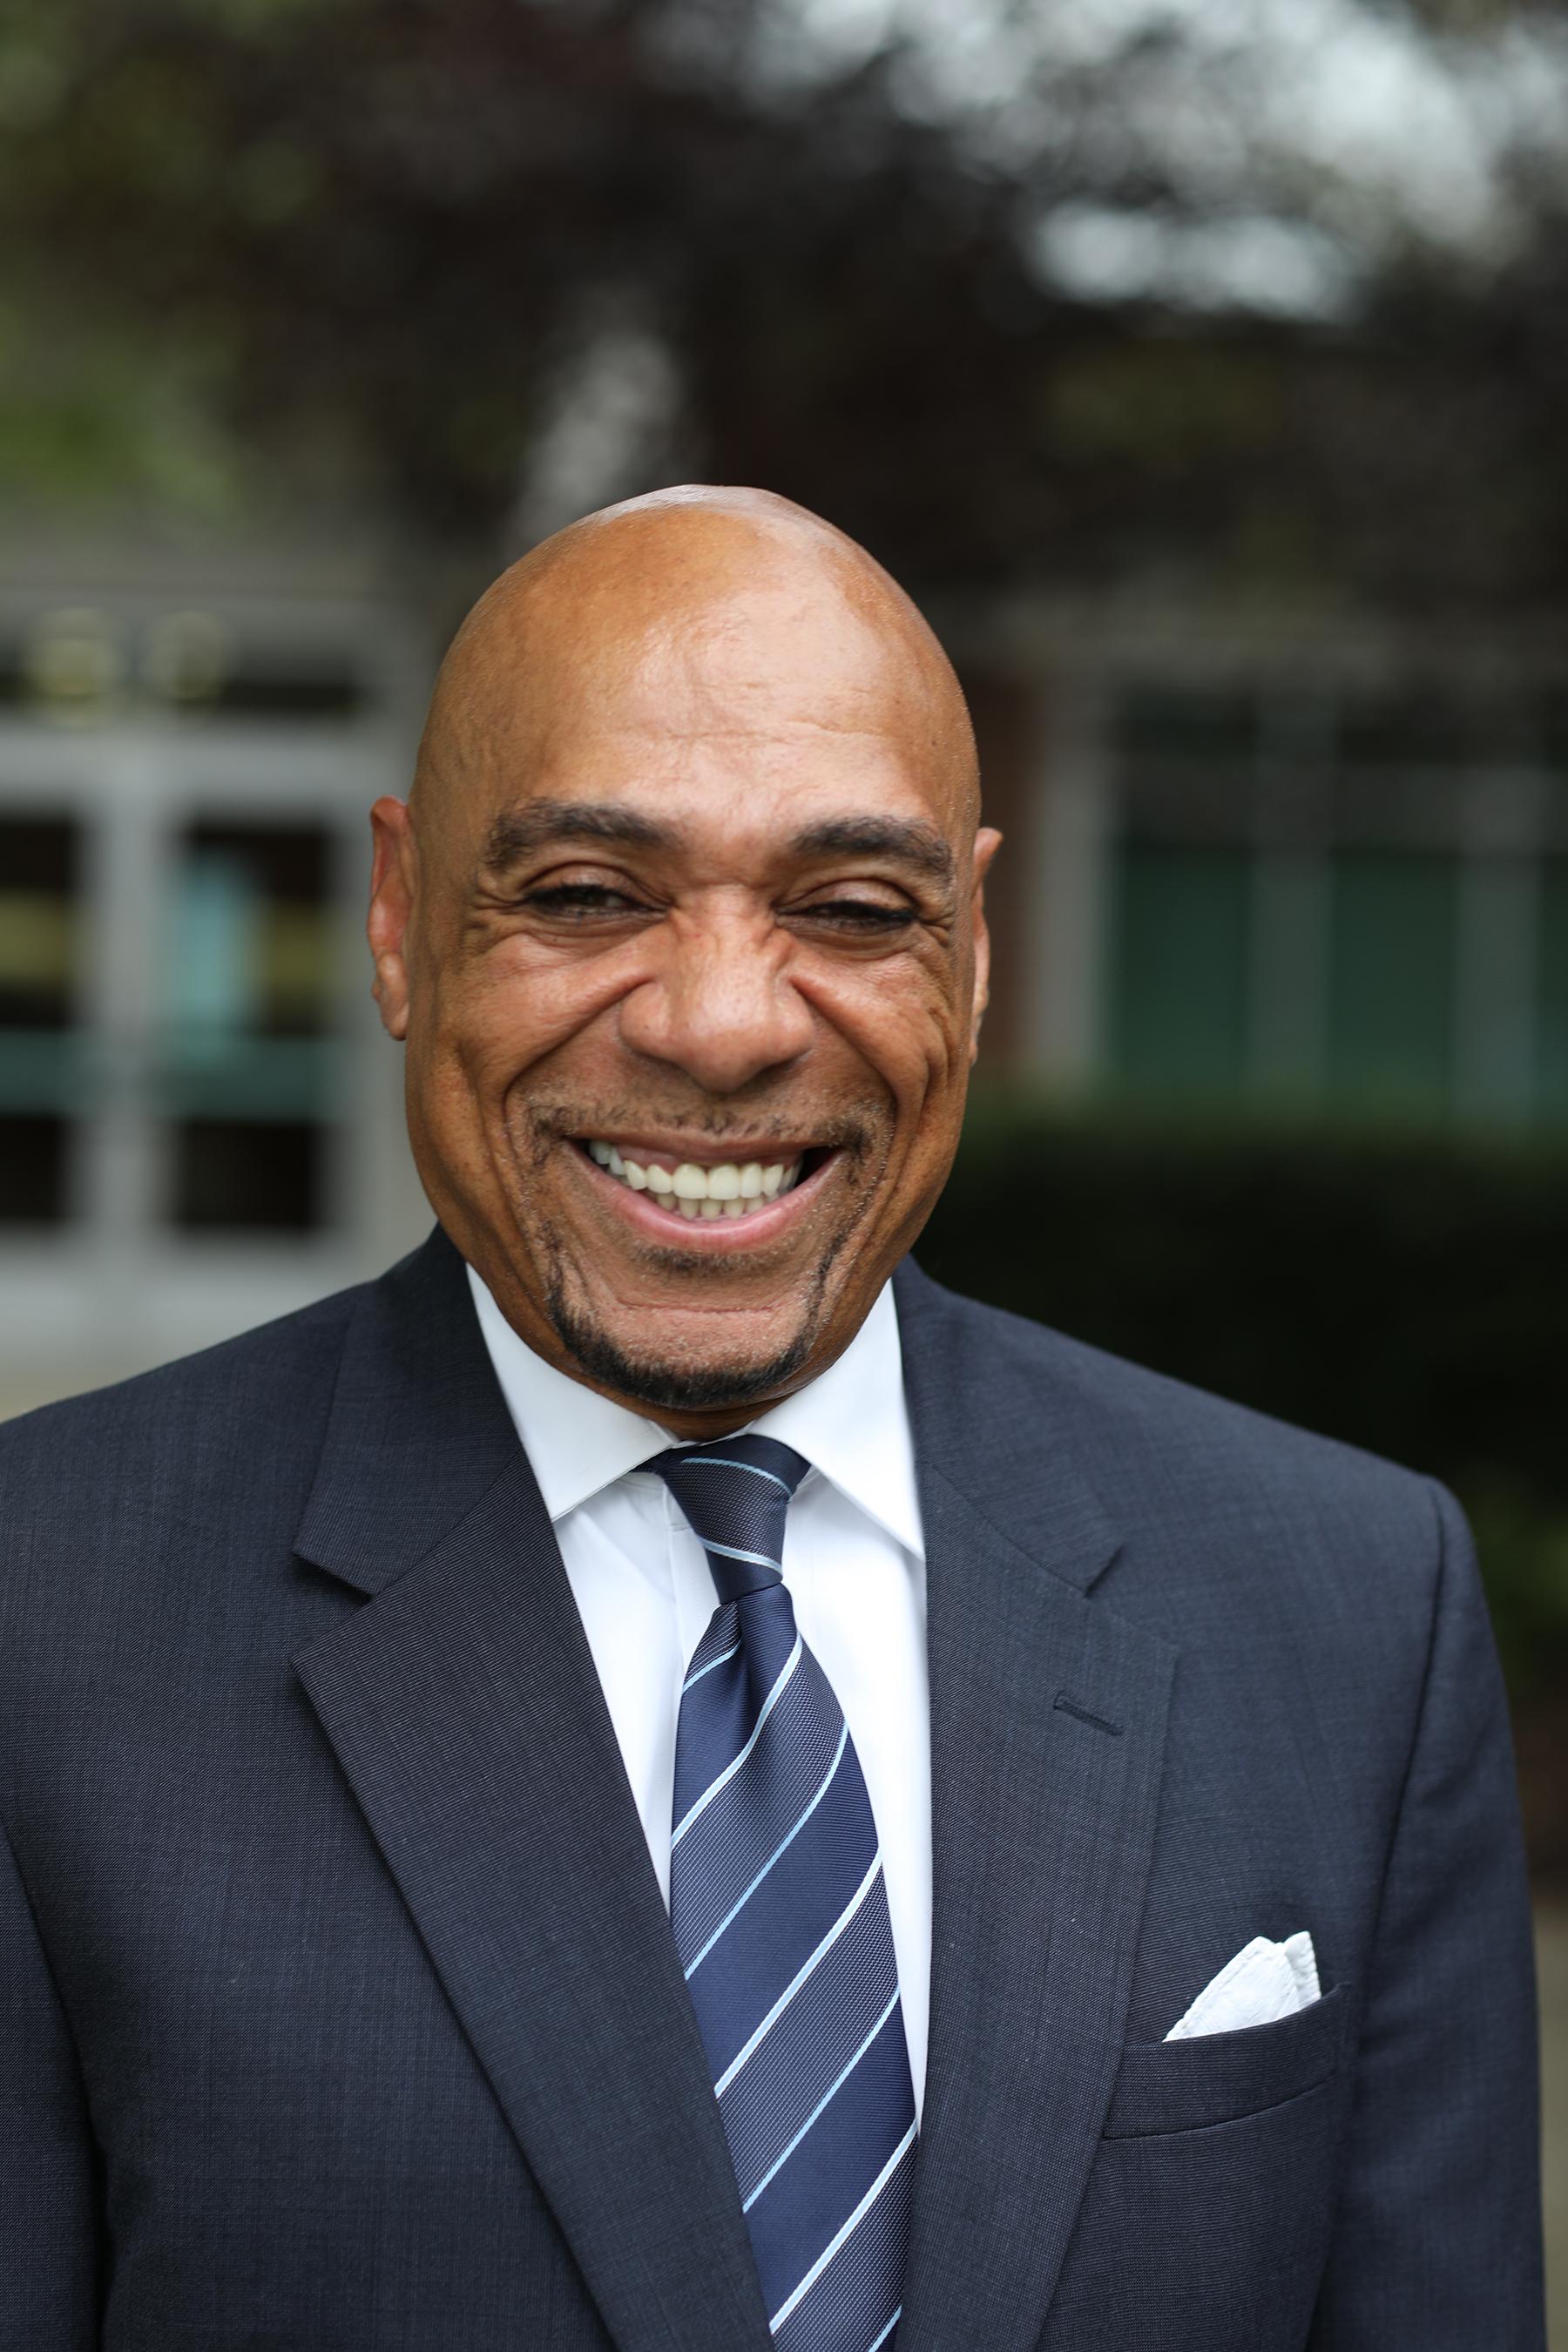 Randy shelton VP of Lending and Capital Development at Virginia United Methodist Development Company